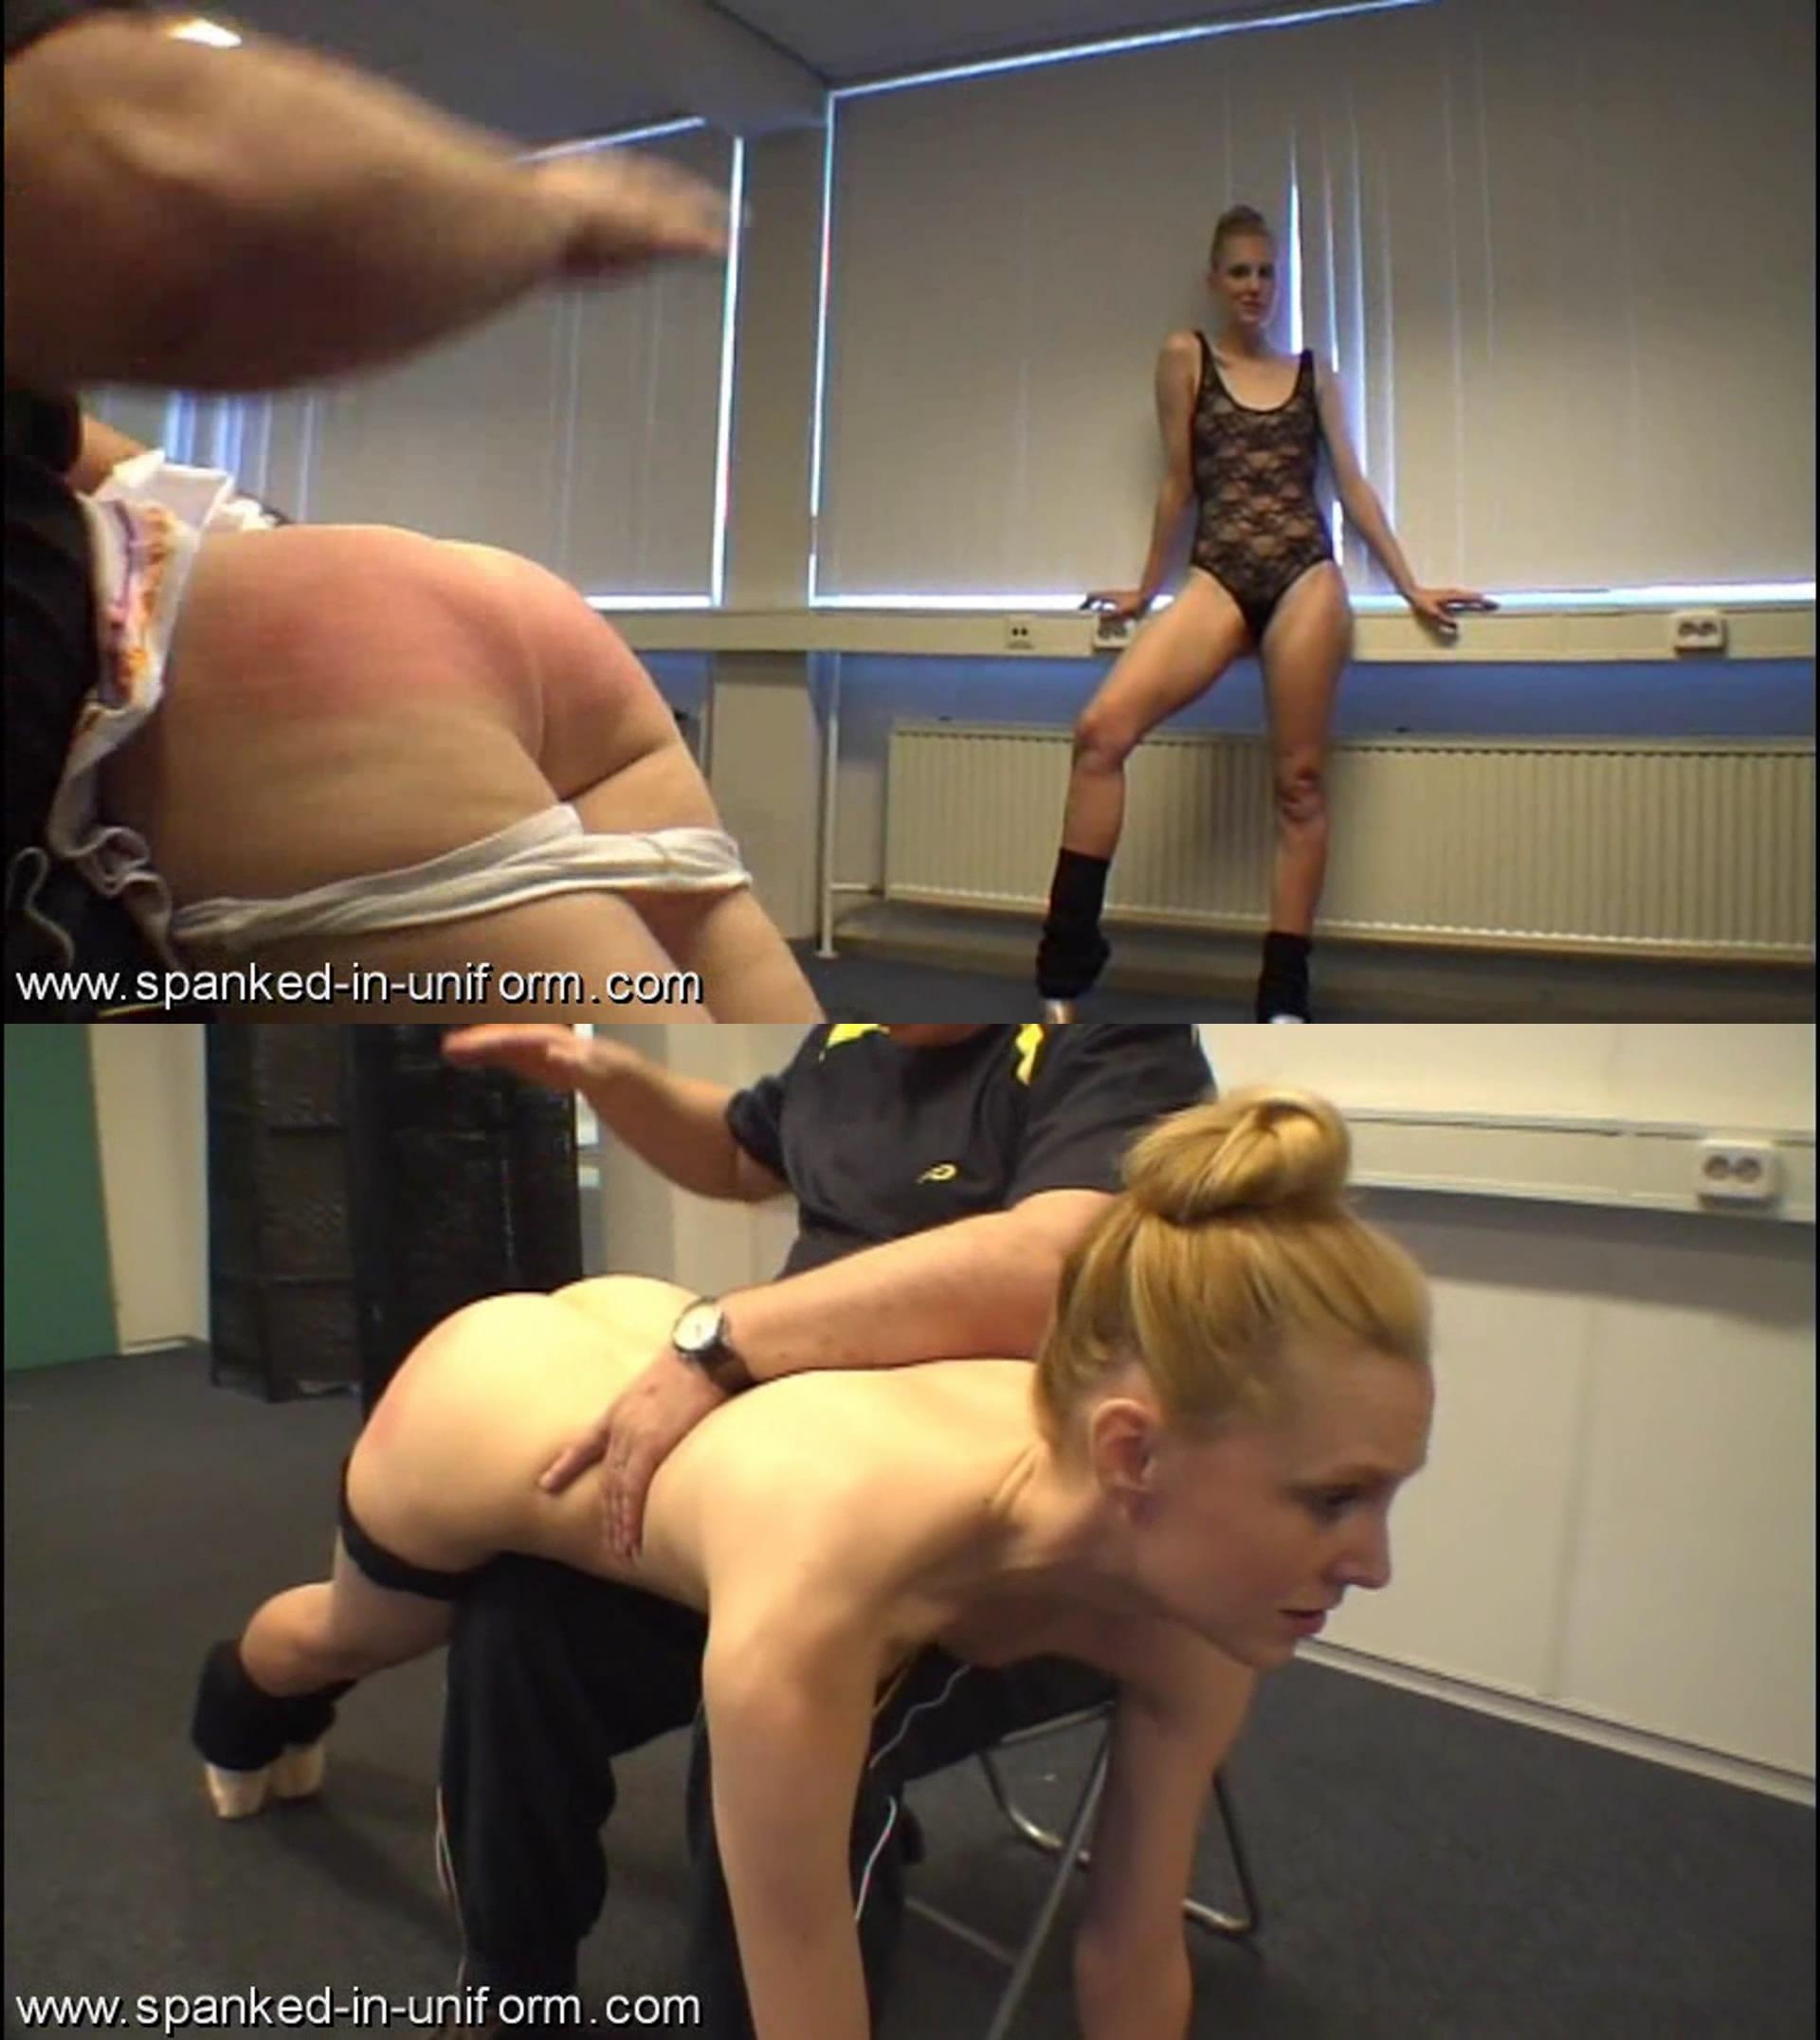 Spanked In Uniform – MP4/Full HD – Rockford School of Dance